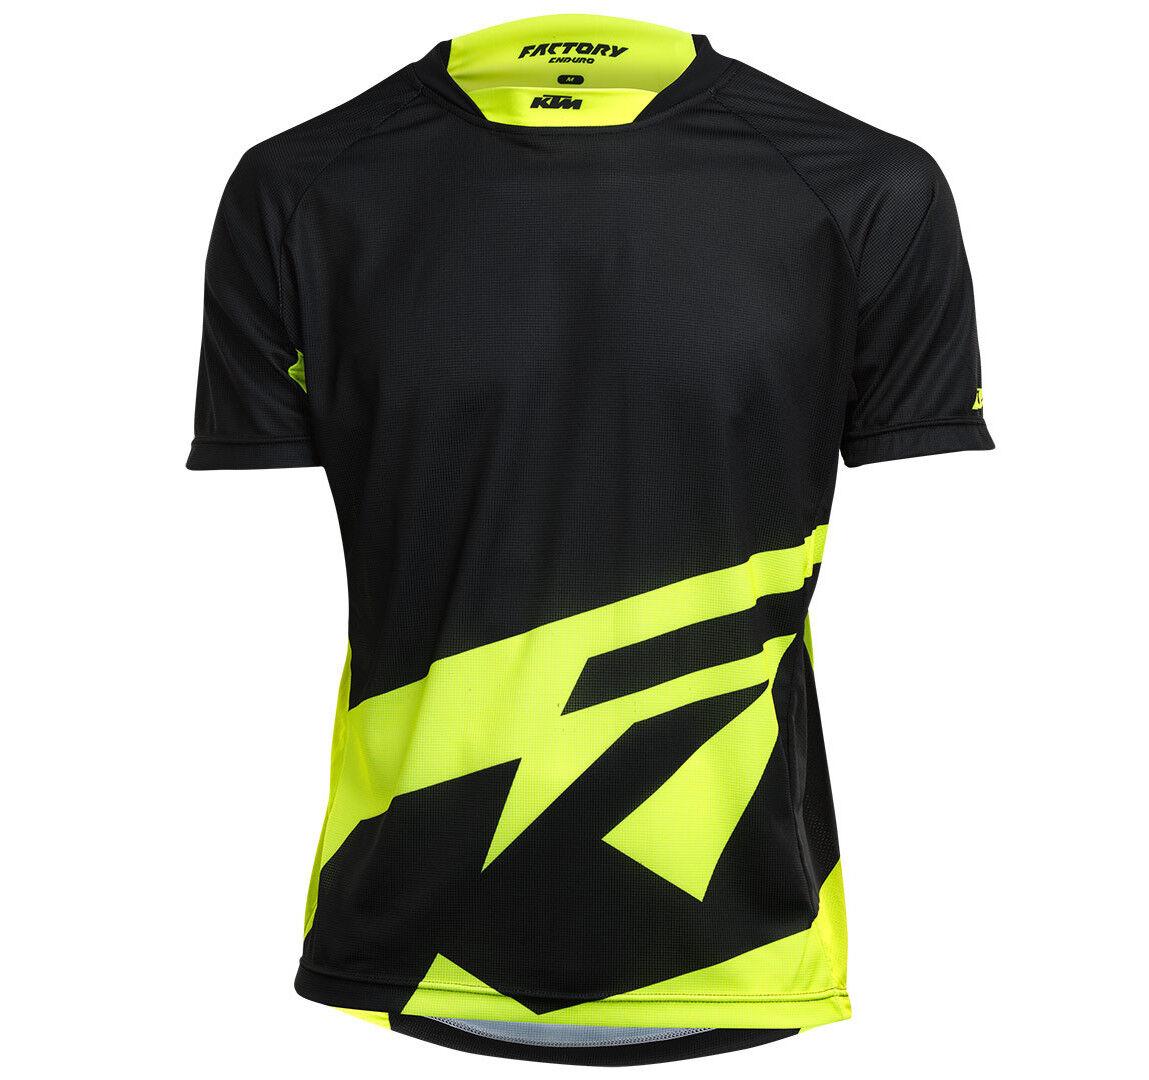 NEU  KTM Shirt kurzarm Factory Enduro Fahrrad Gr. XL Schwarz-Gelb Trikot